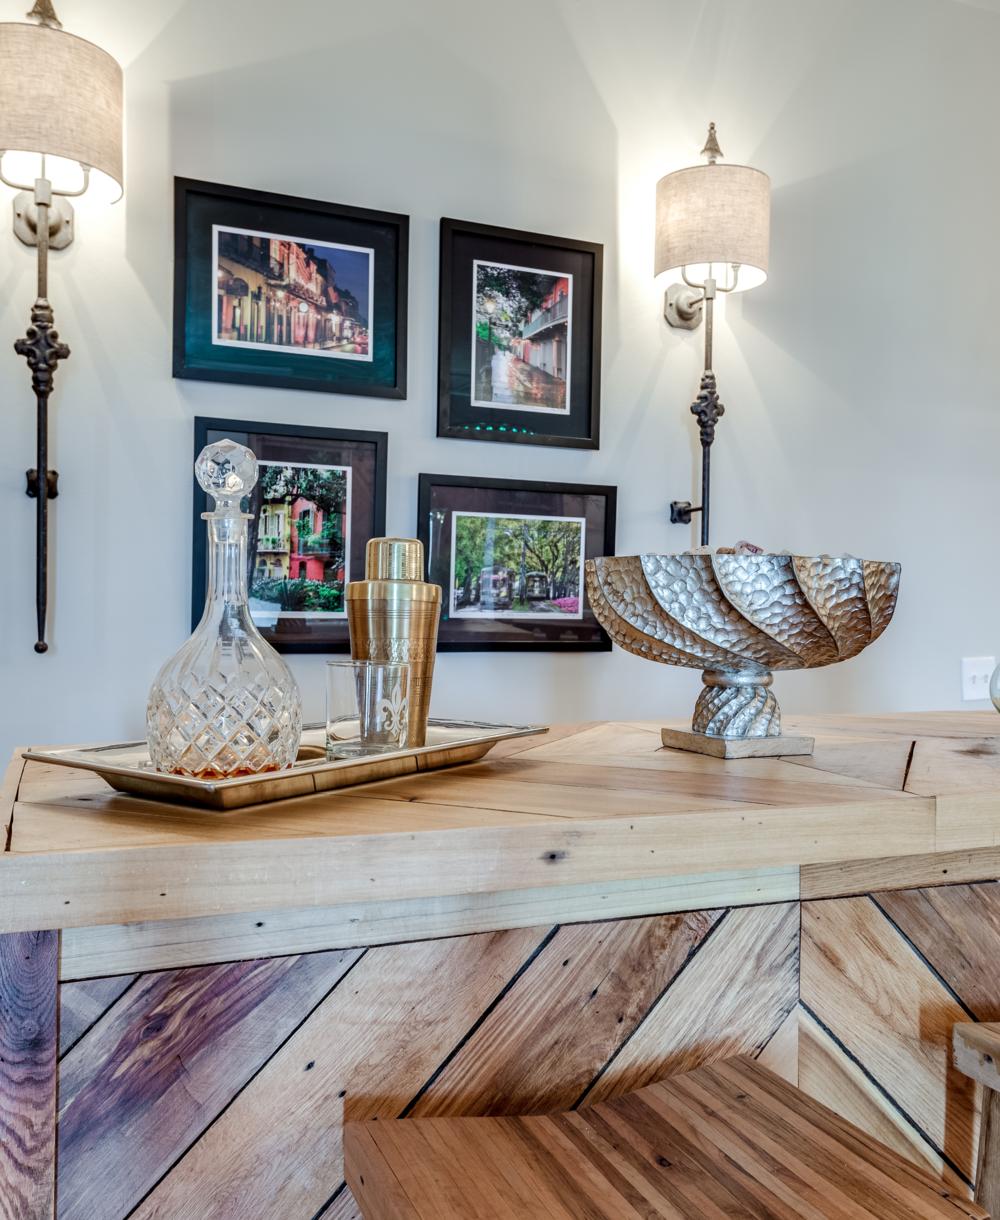 wall art ideas new orleans residential interior design khb interiors